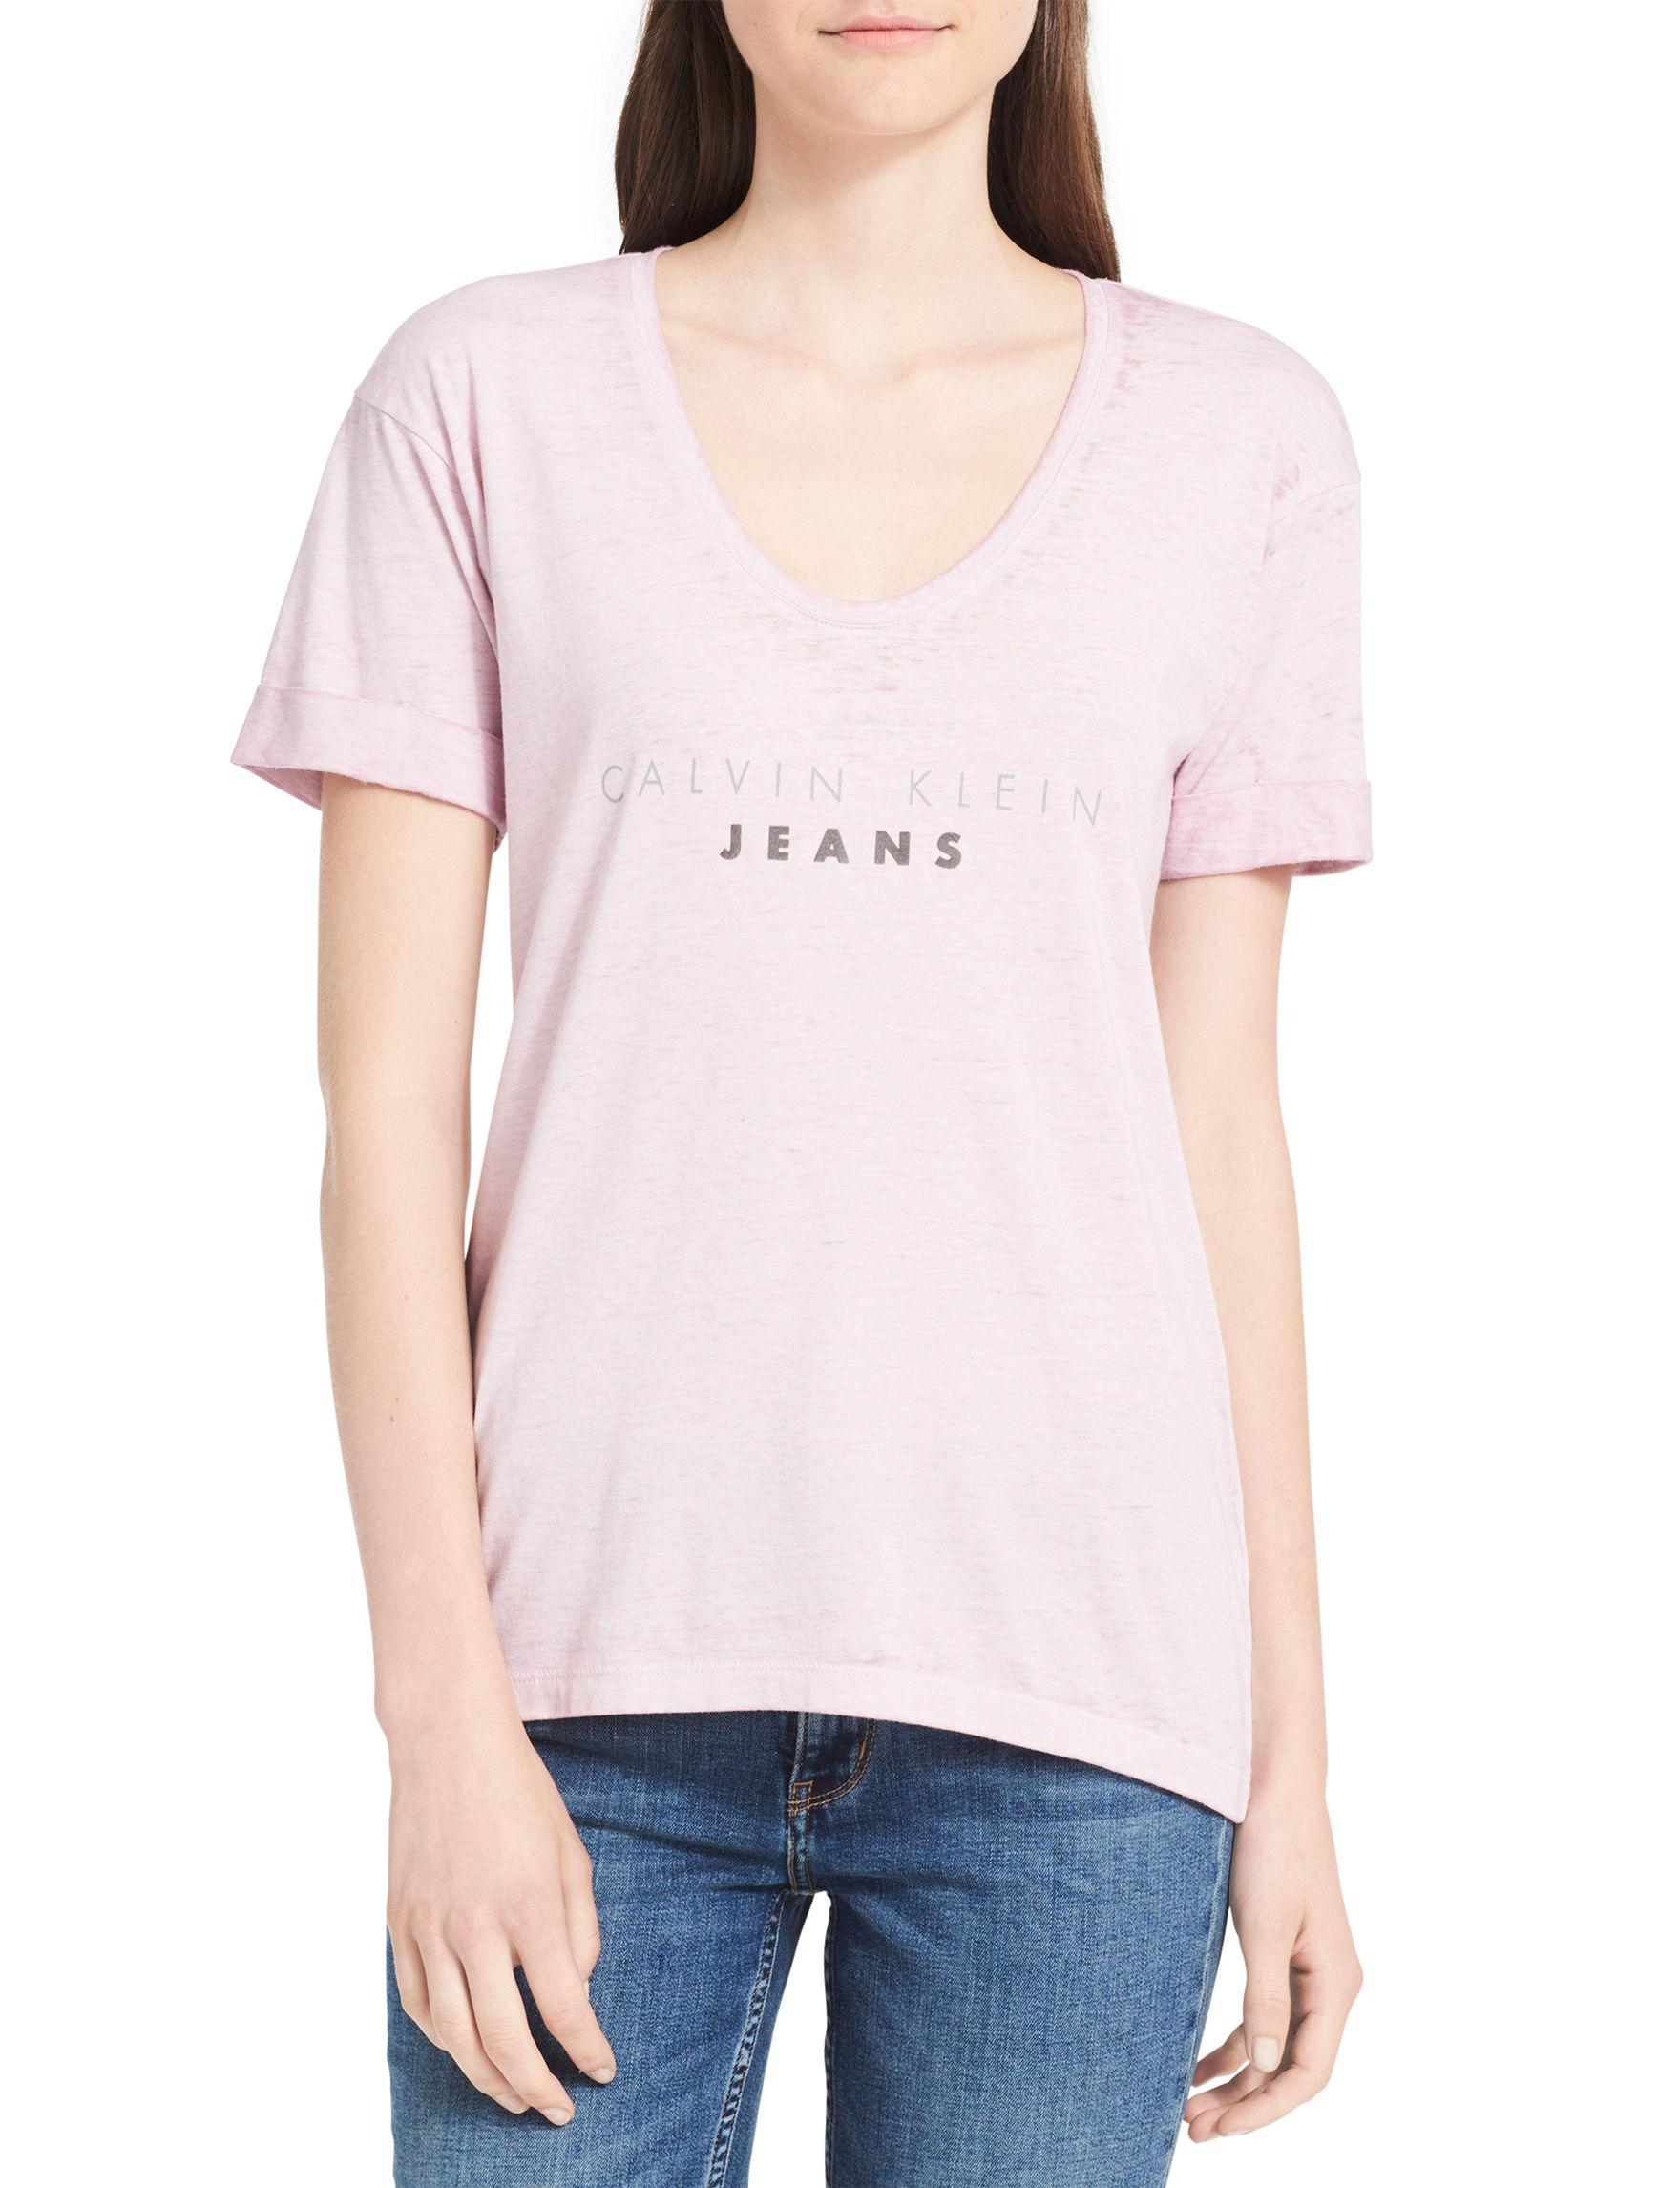 Calvin Klein Jeans Pink Tees & Tanks